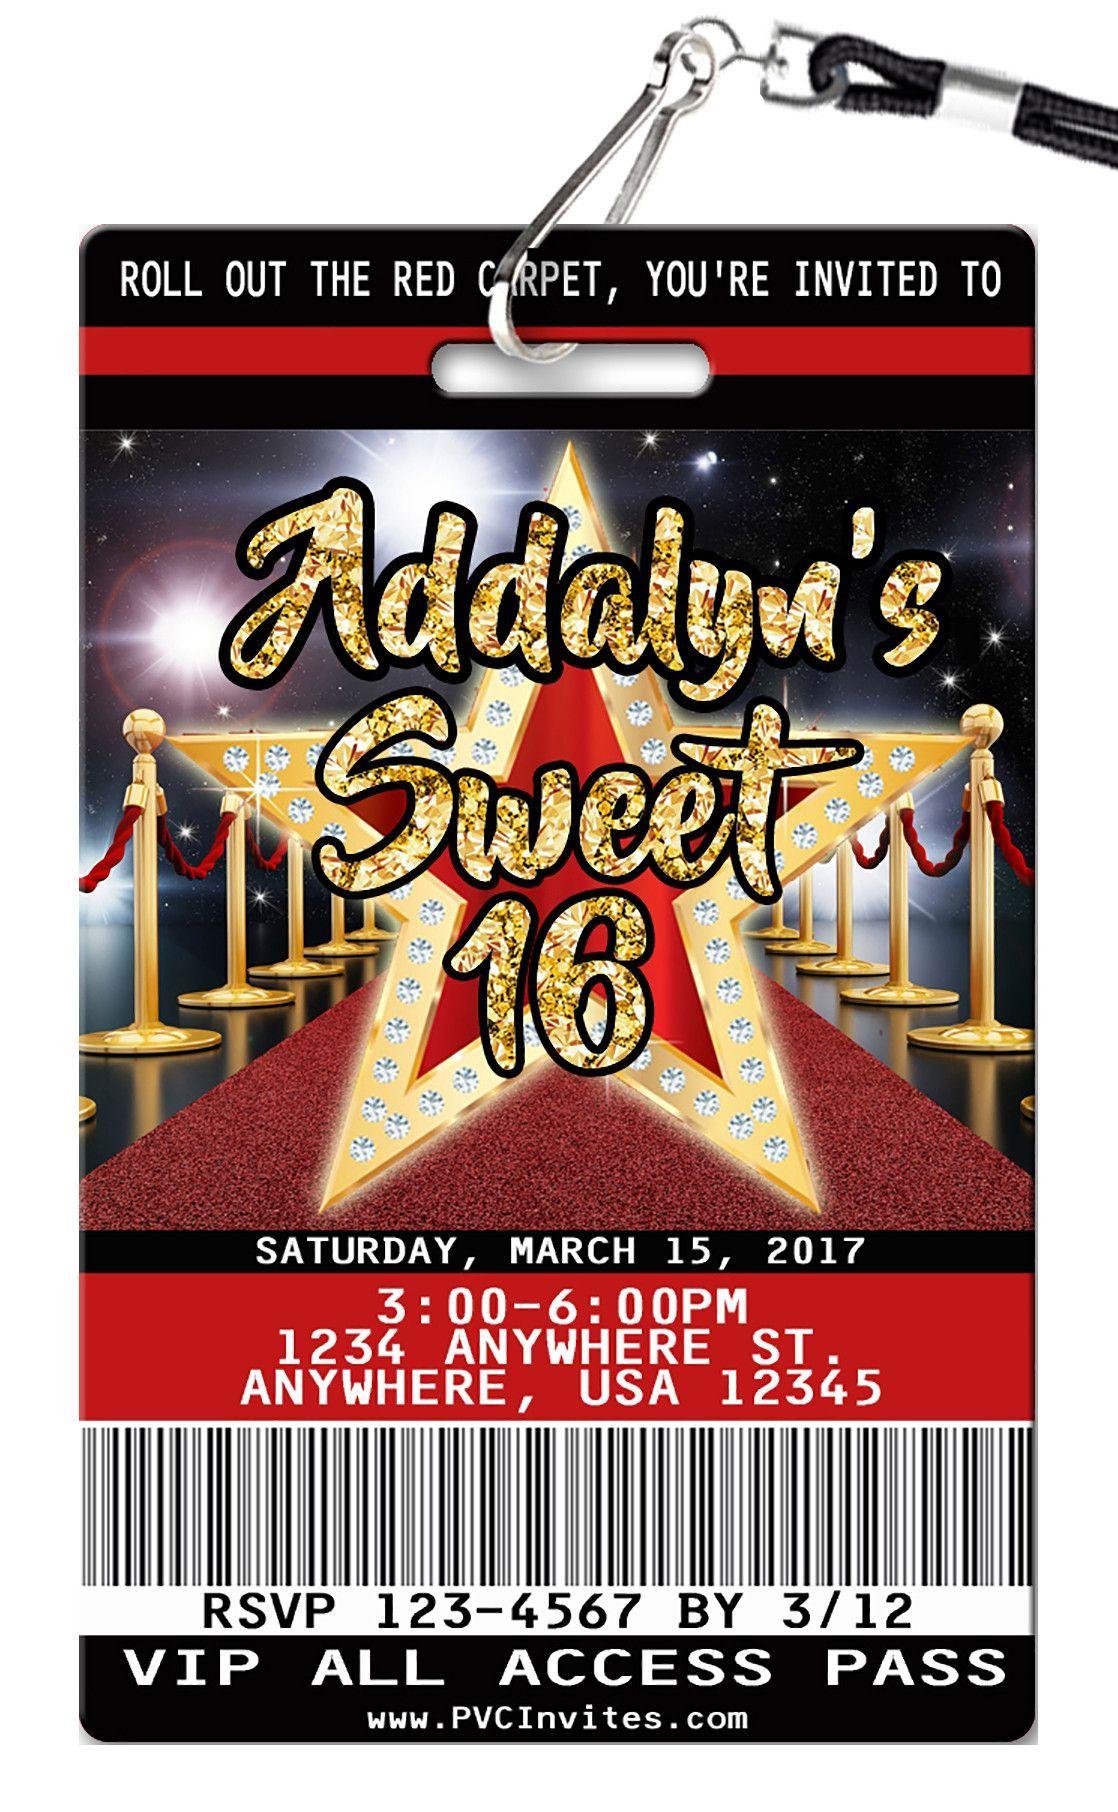 Sweet 16 Birthday Invitation Sweet 16 party themes